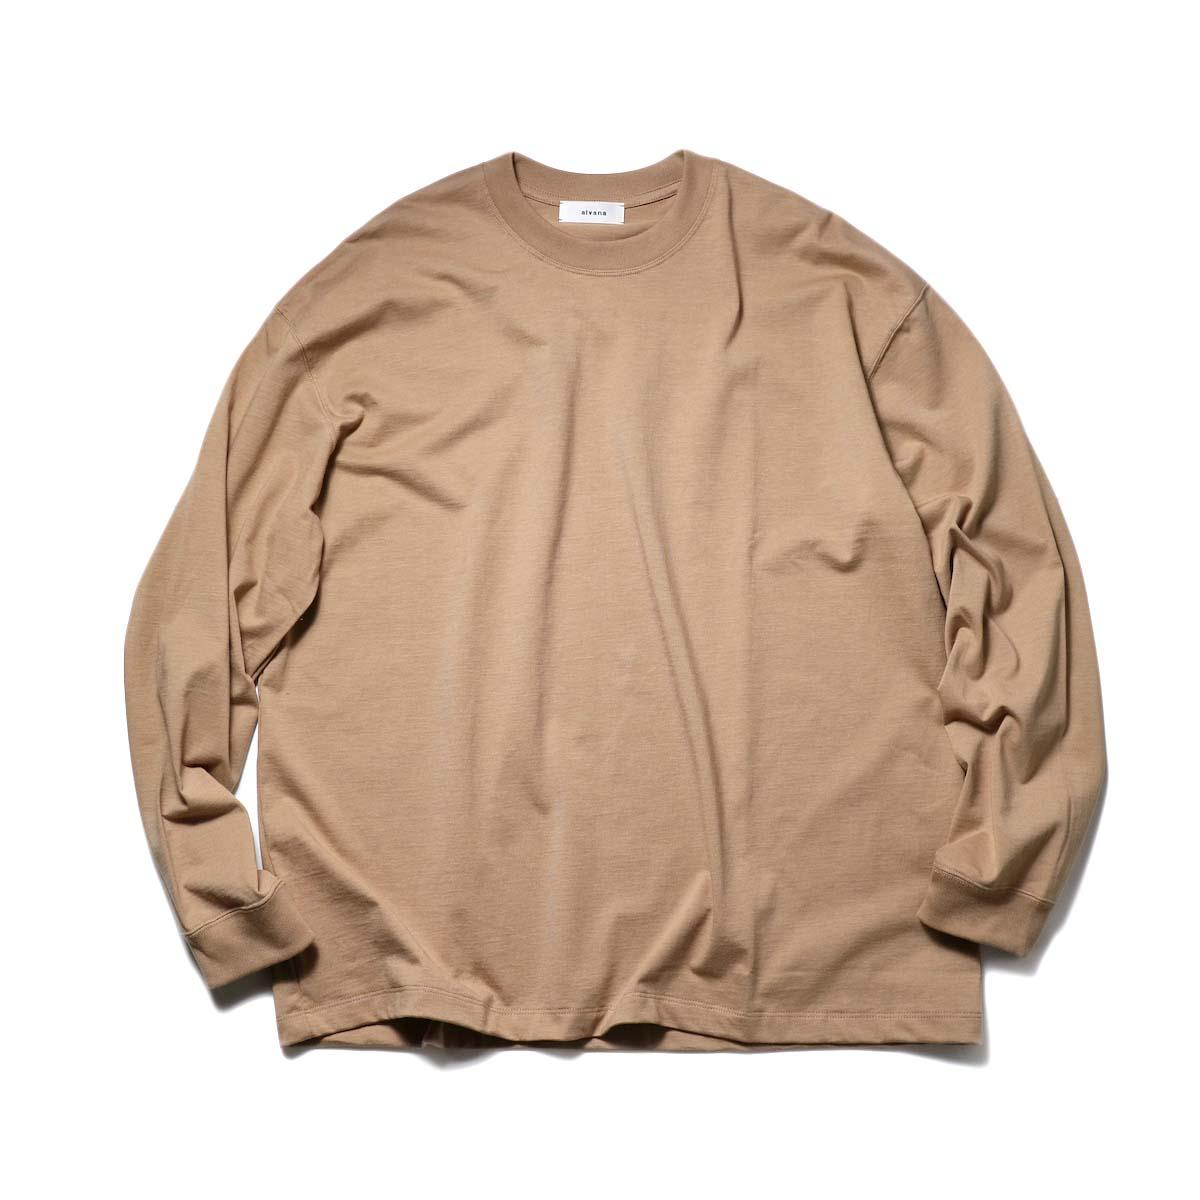 alvana / TANGUIS L/S TEE SHIRTS (Light Brown)